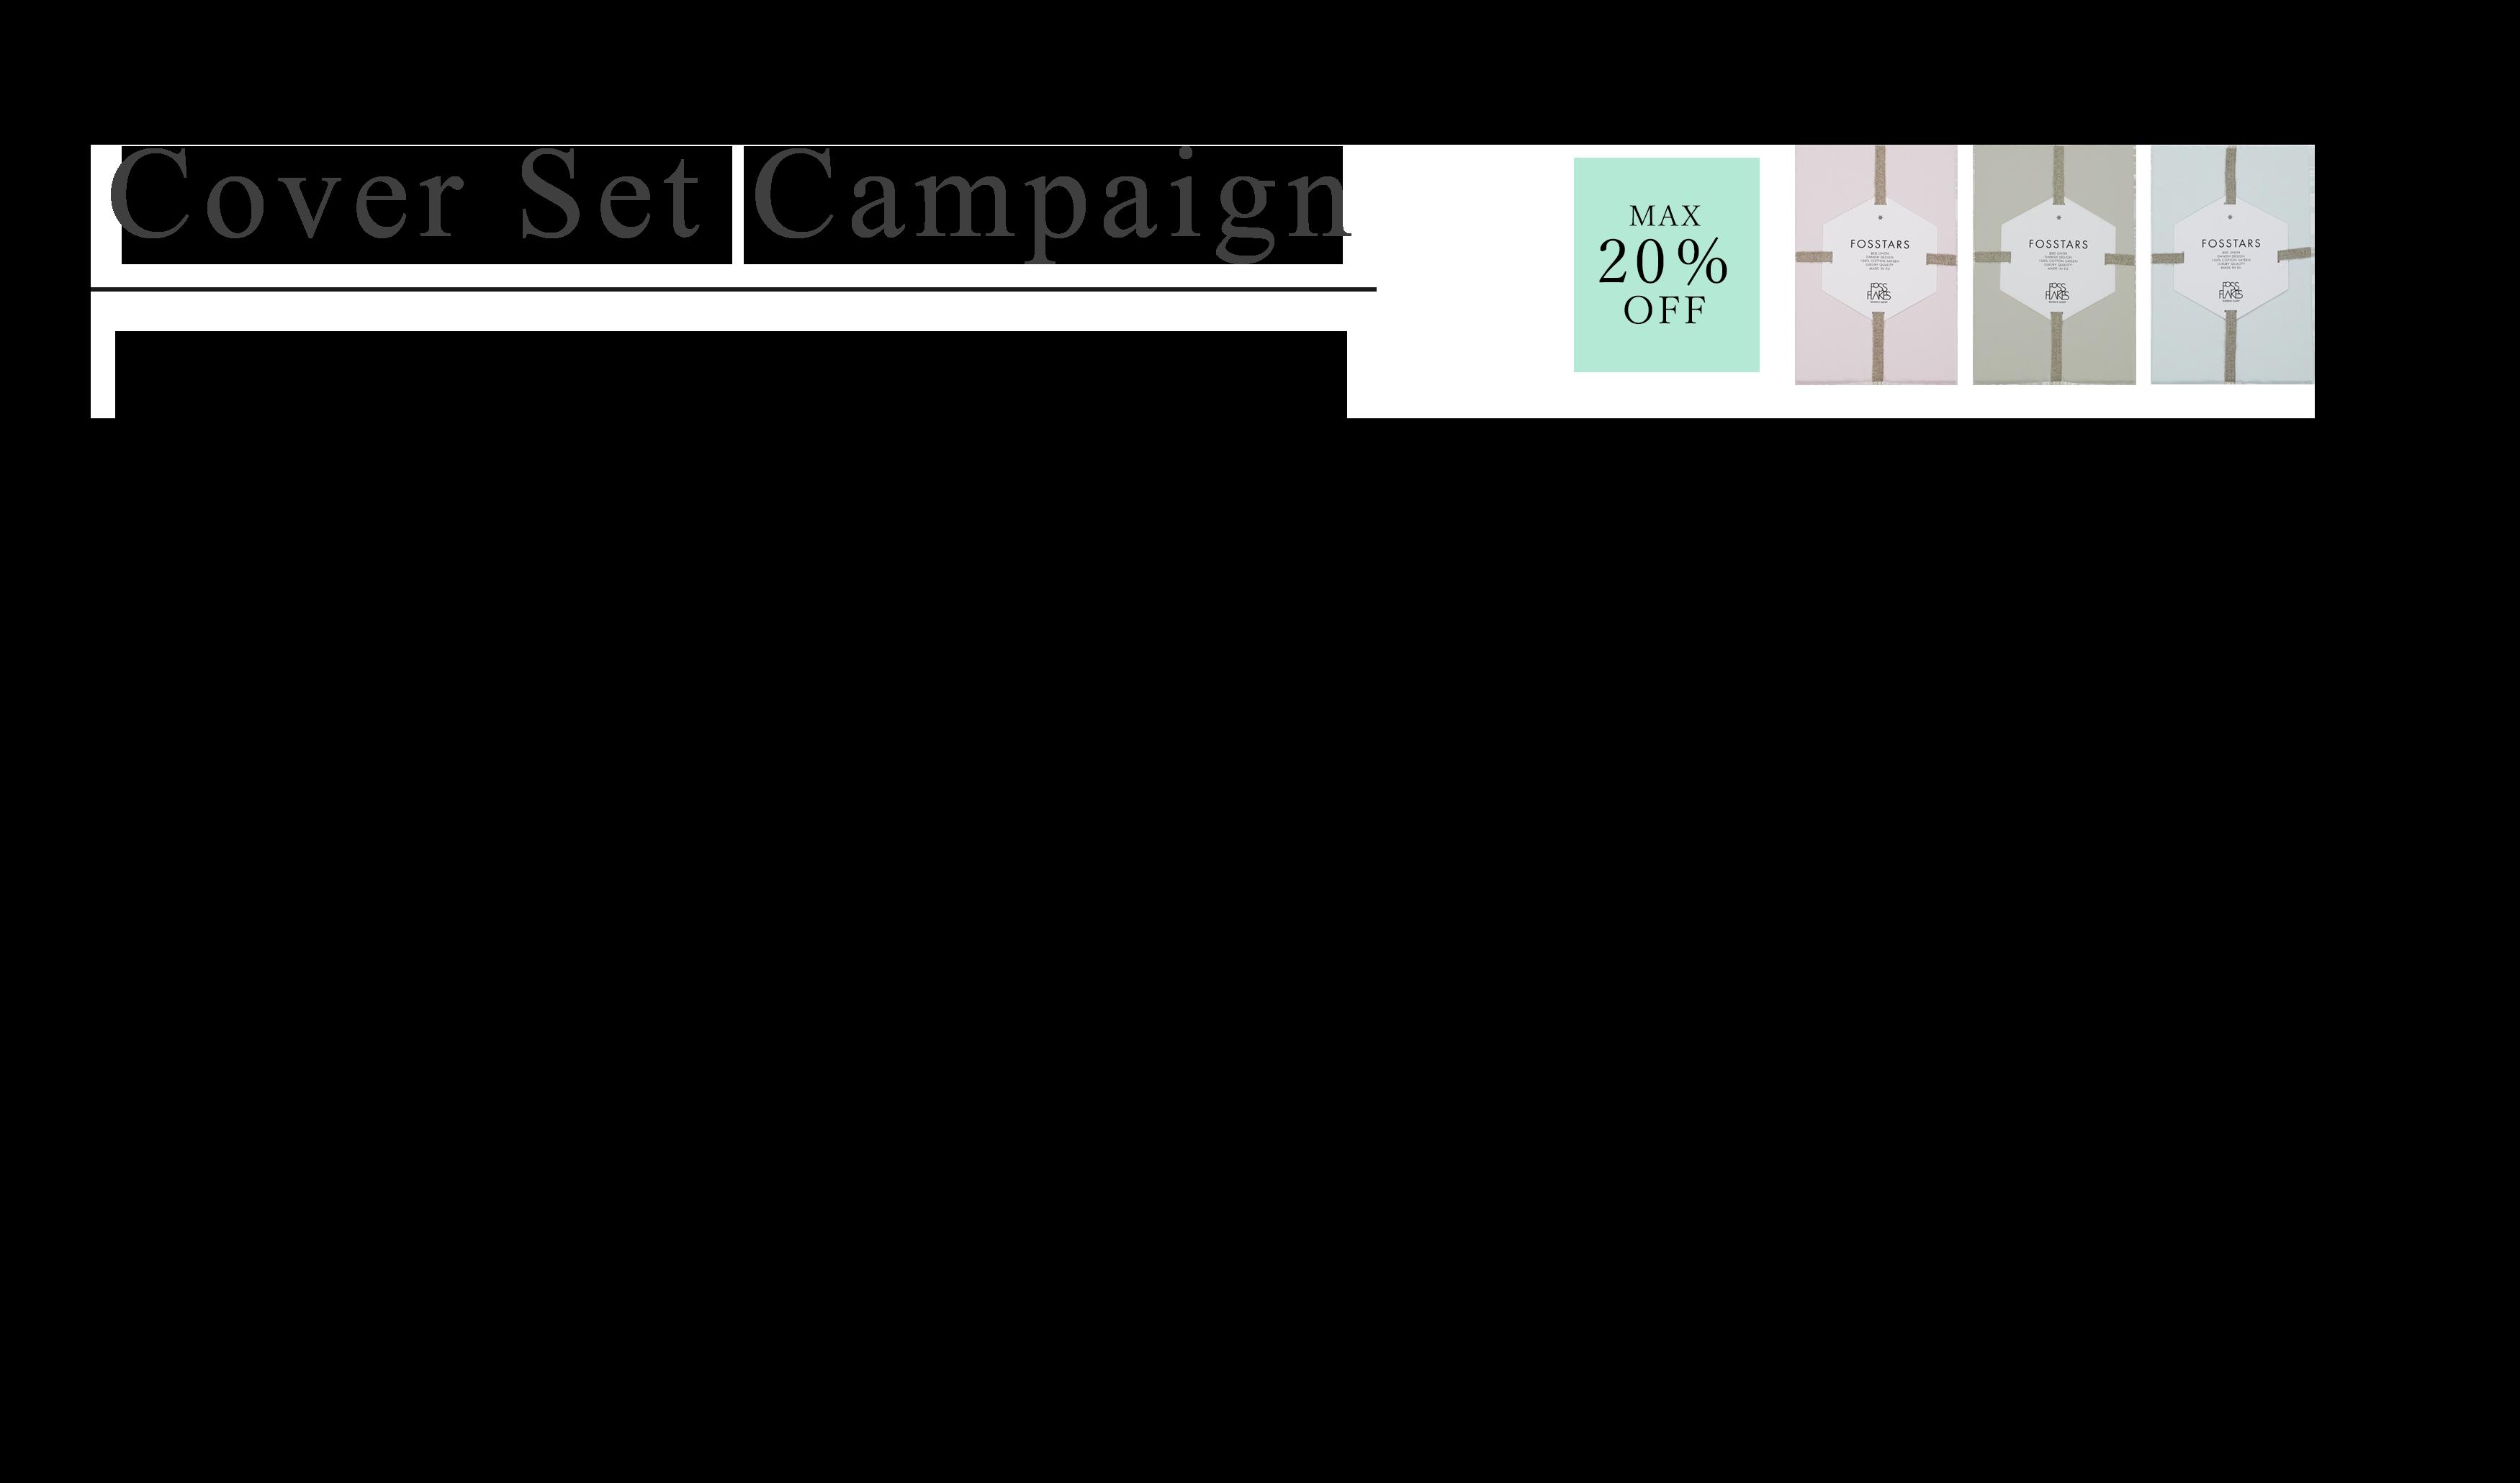 Cover Set Campaign